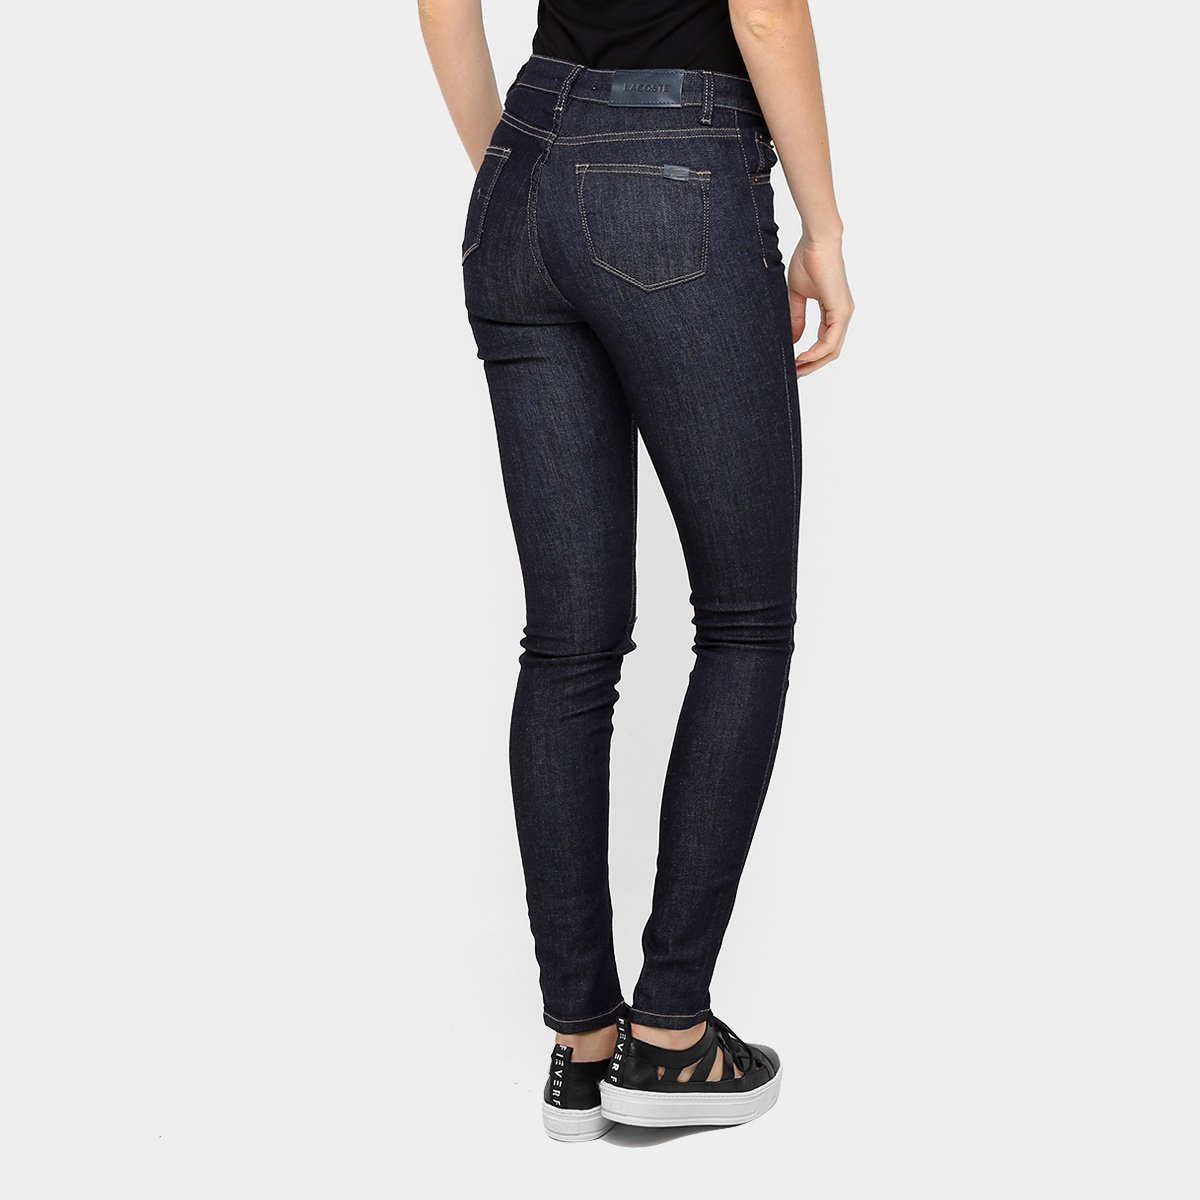 Calça Jeans Skinny Lacoste Lavagem Escura Feminina - Jeans - Compre ... 93de07a33a